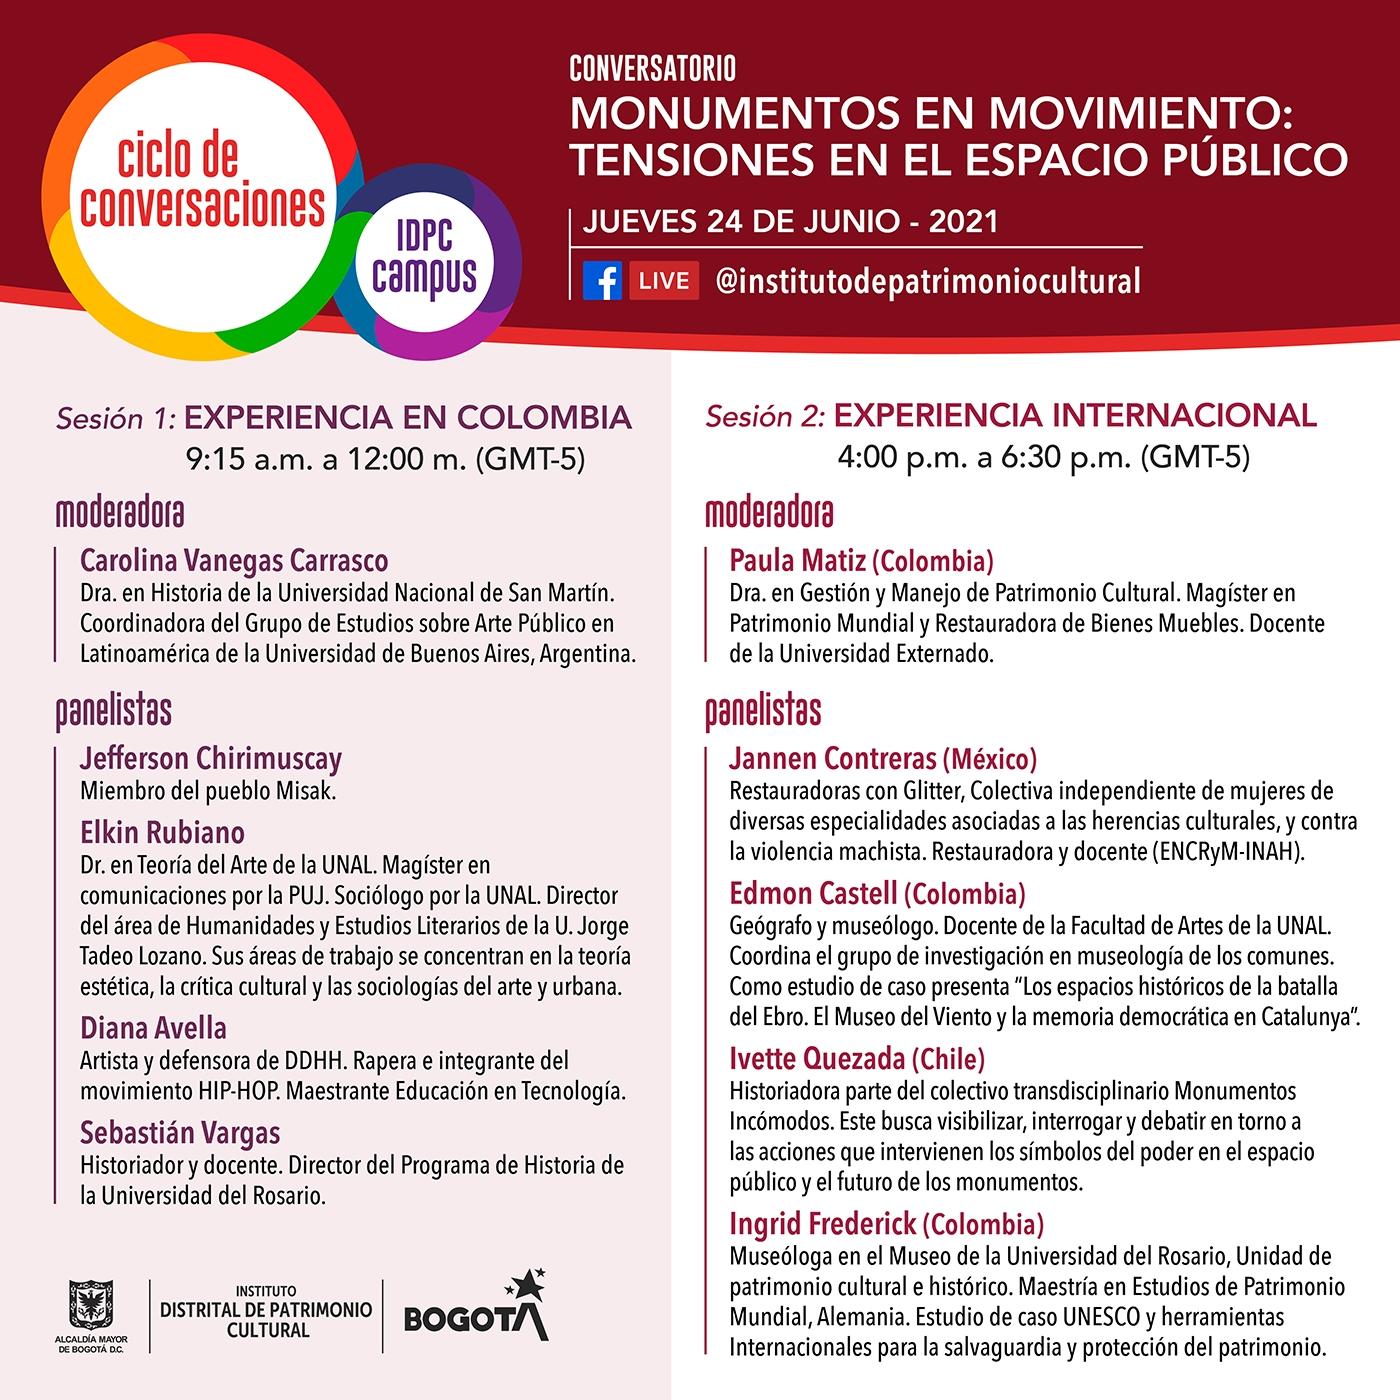 IDPC - IDPC Campus - Momumentos junio 24 2021_3